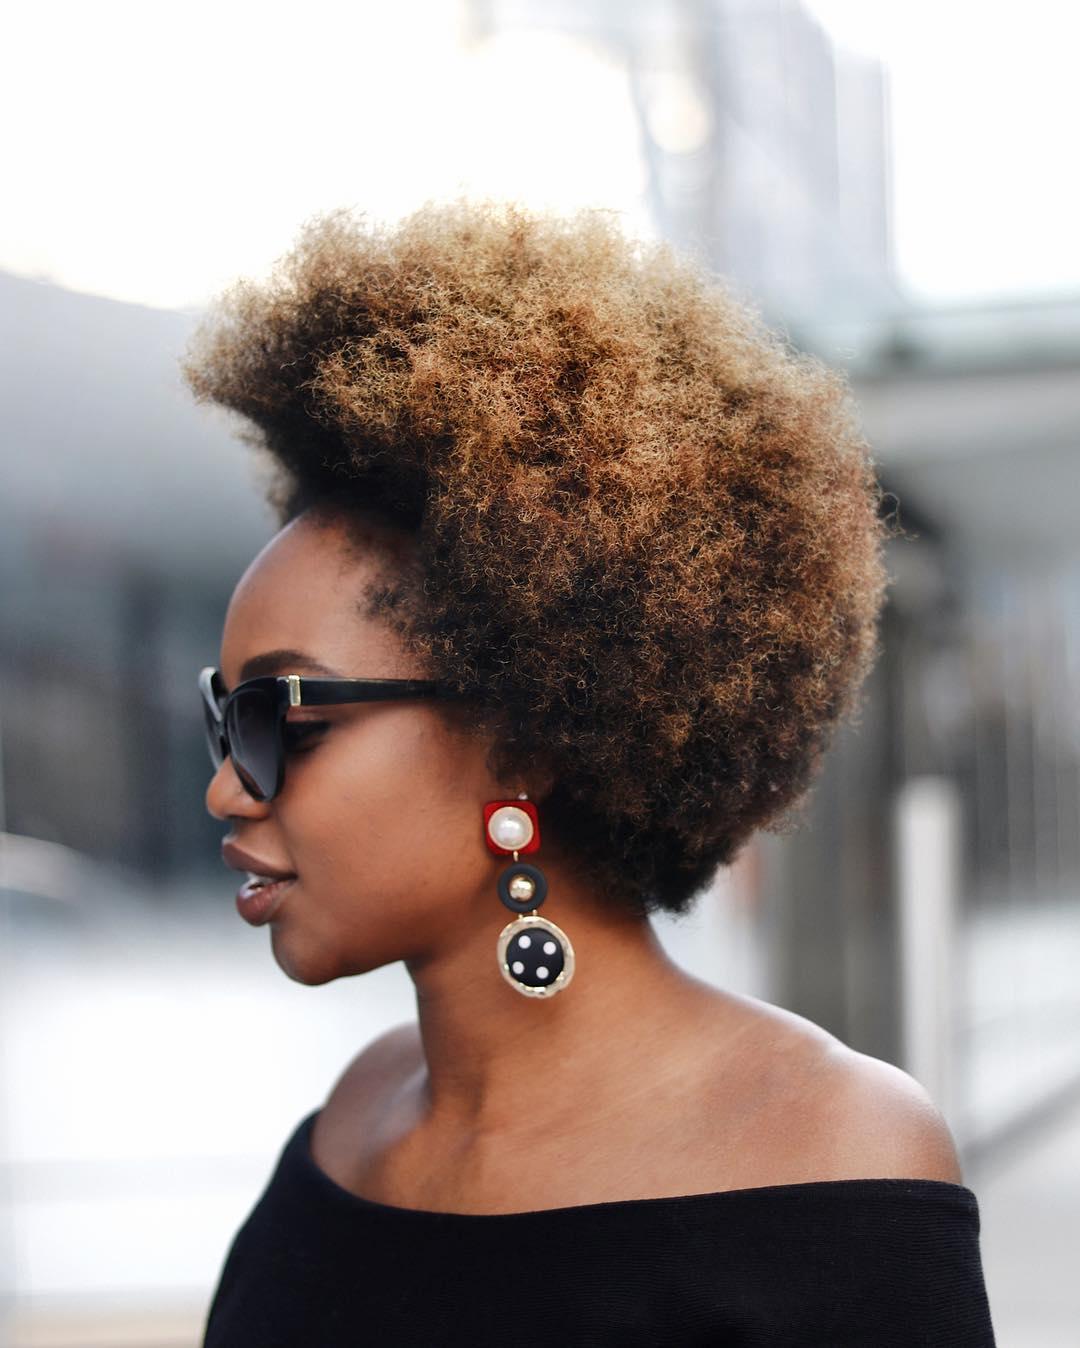 Best Haircuts 2020: 150 ideas for transforming locks 99